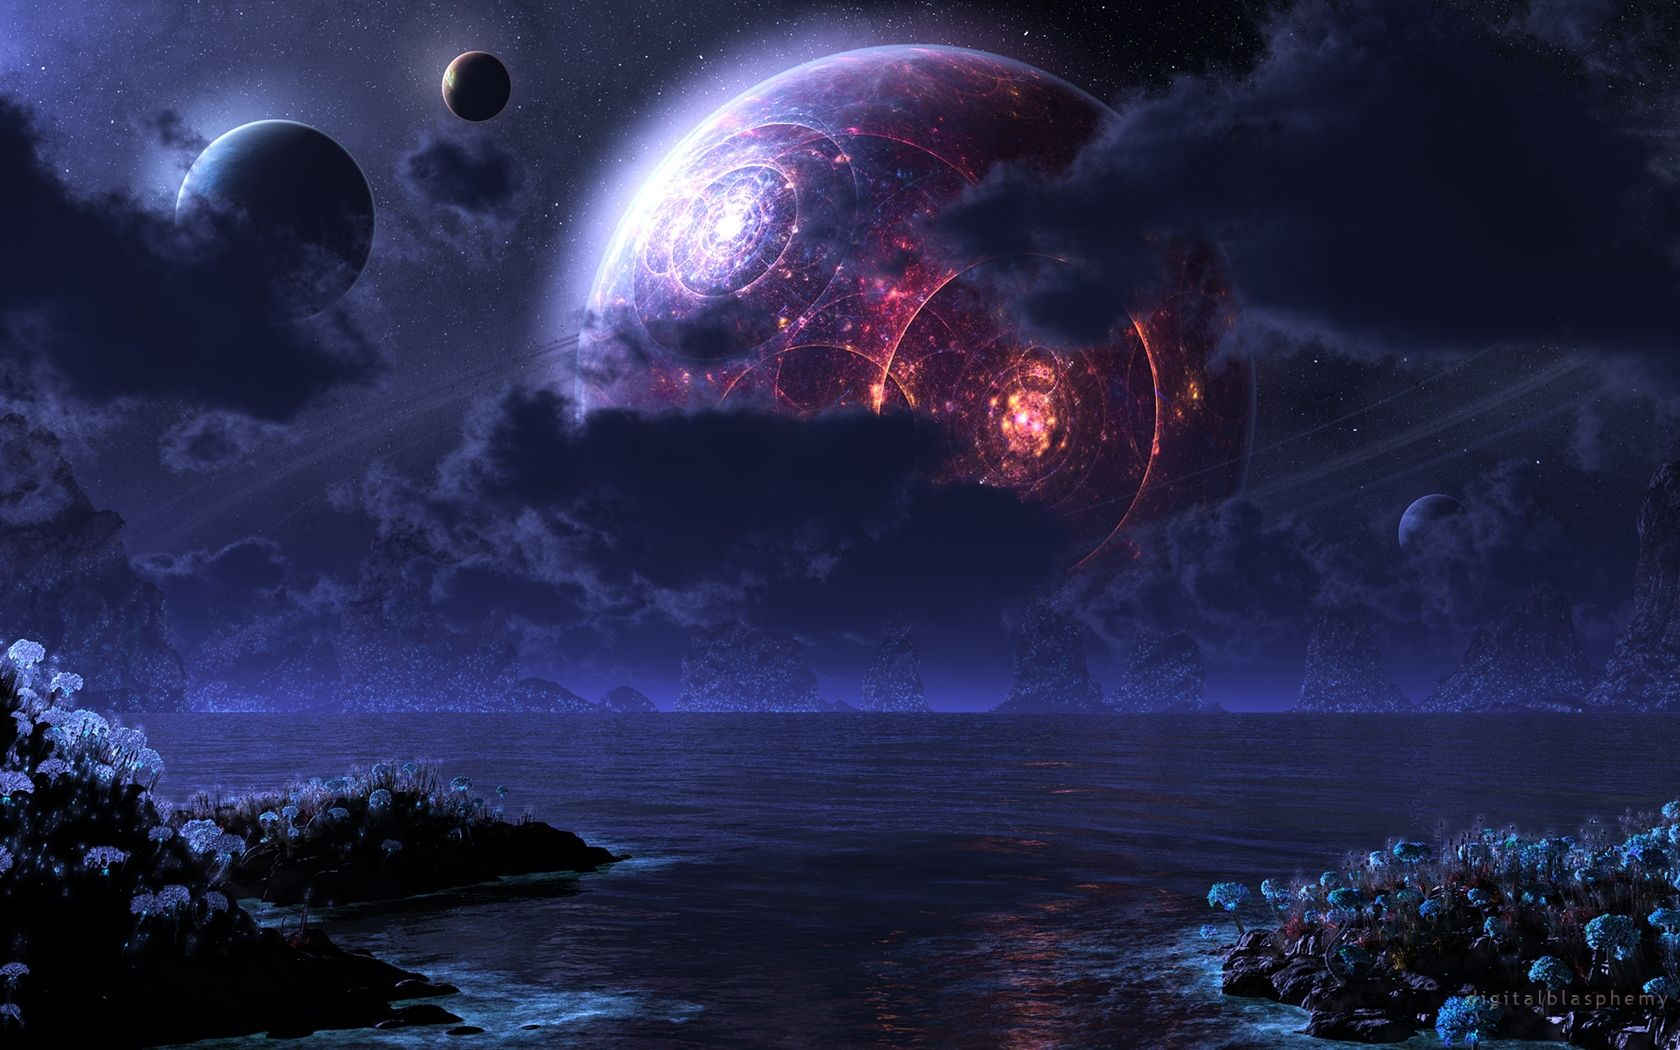 Digital Blasphemy 3d Wallpaper Phraxis Moon 2011 Free Scenery Wallpaper Planets Wallpaper Sci Fi Wallpaper